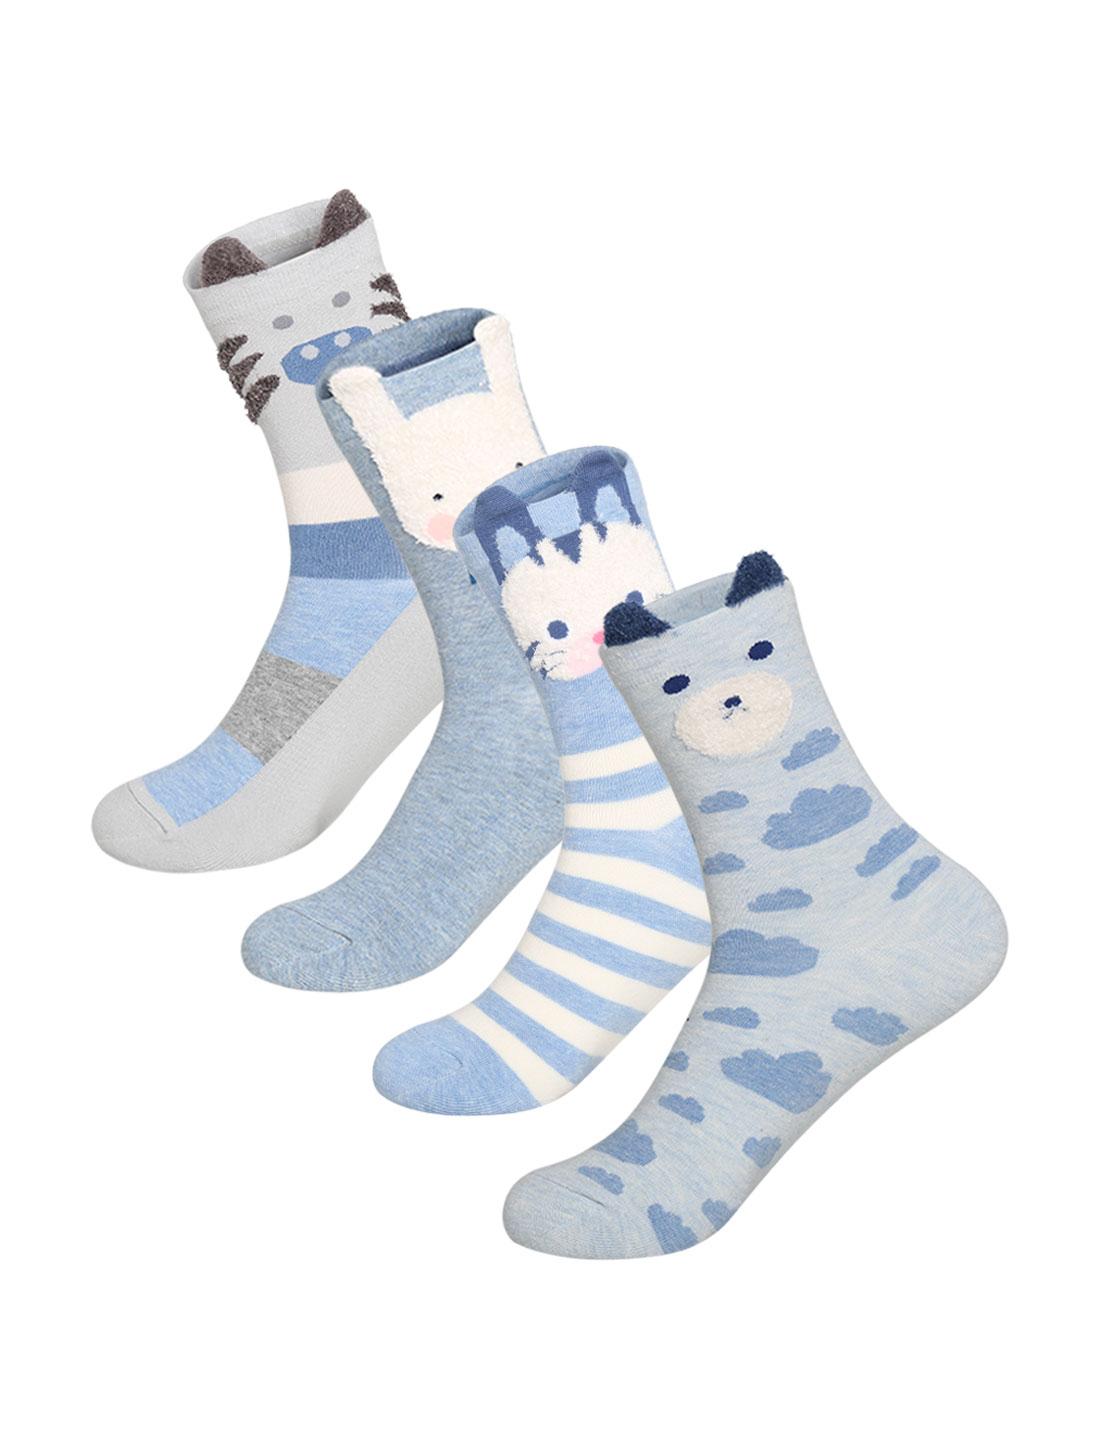 Women 4 pair Animal Stripes Novelty Pattern Crew Socks 9-11 Assorted-Blue